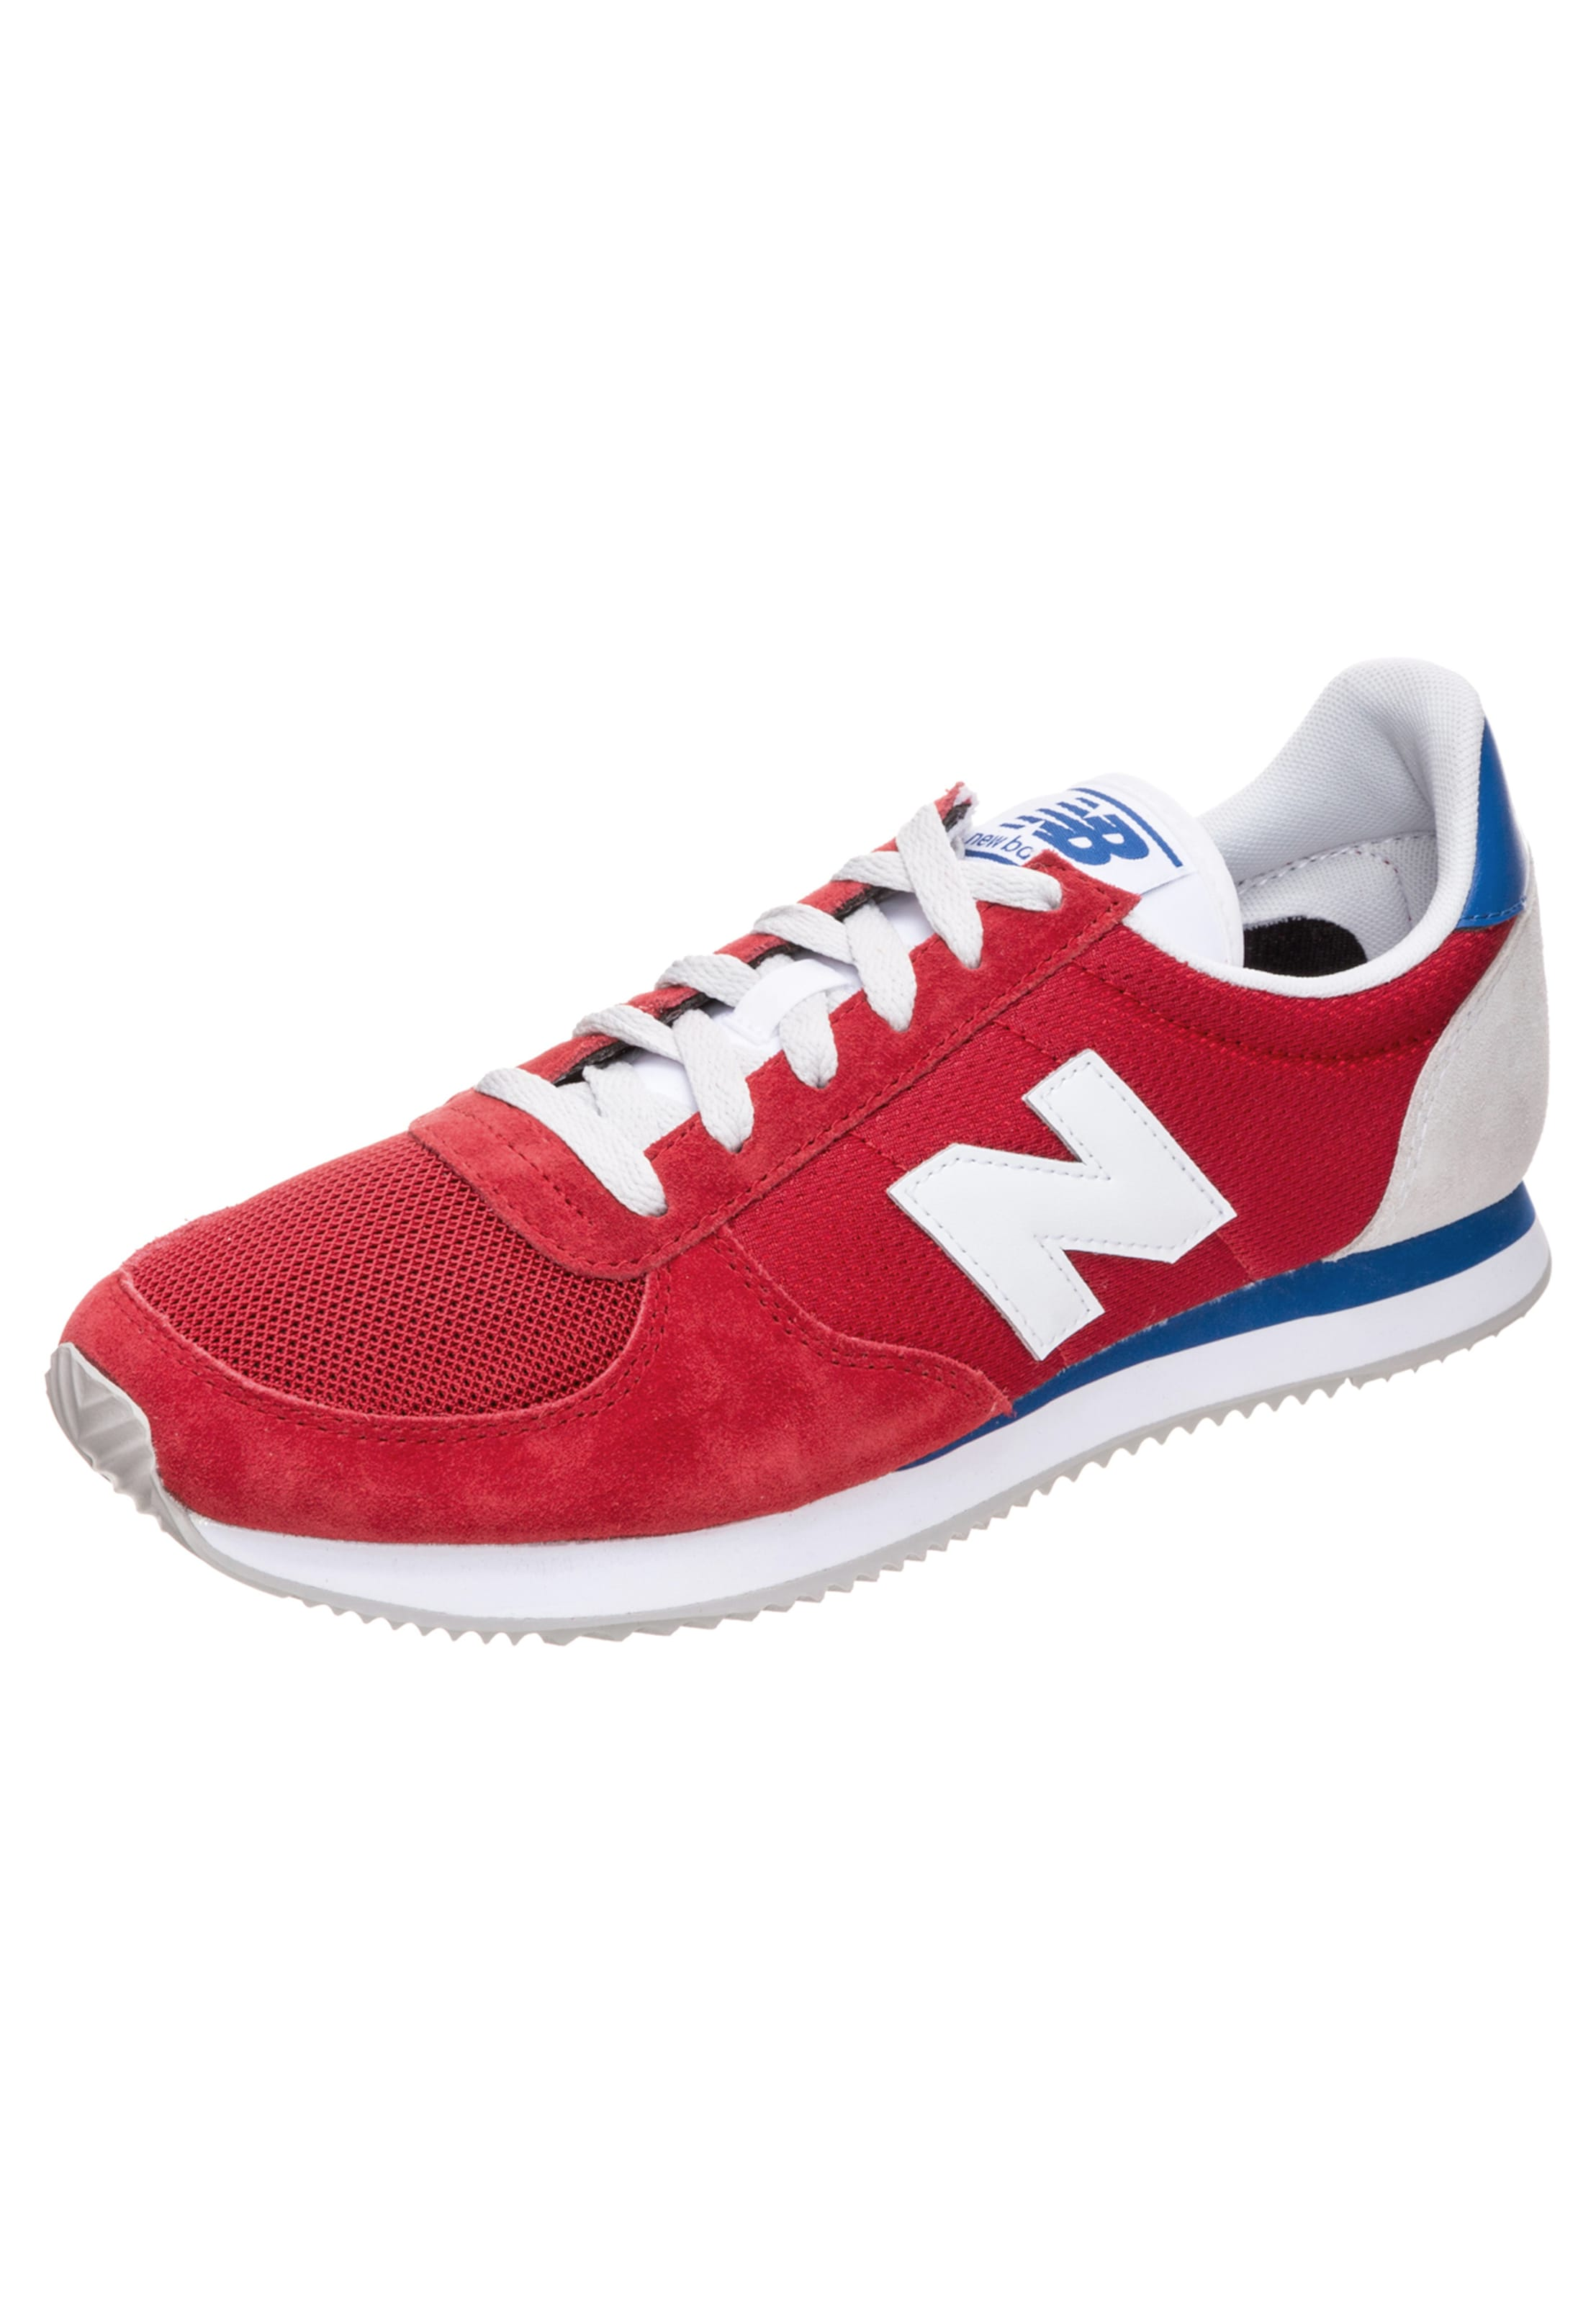 Haltbare balance Mode billige Schuhe new balance Haltbare | 'U220-DB-D' Sneaker Schuhe Gut getragene Schuhe e41e51